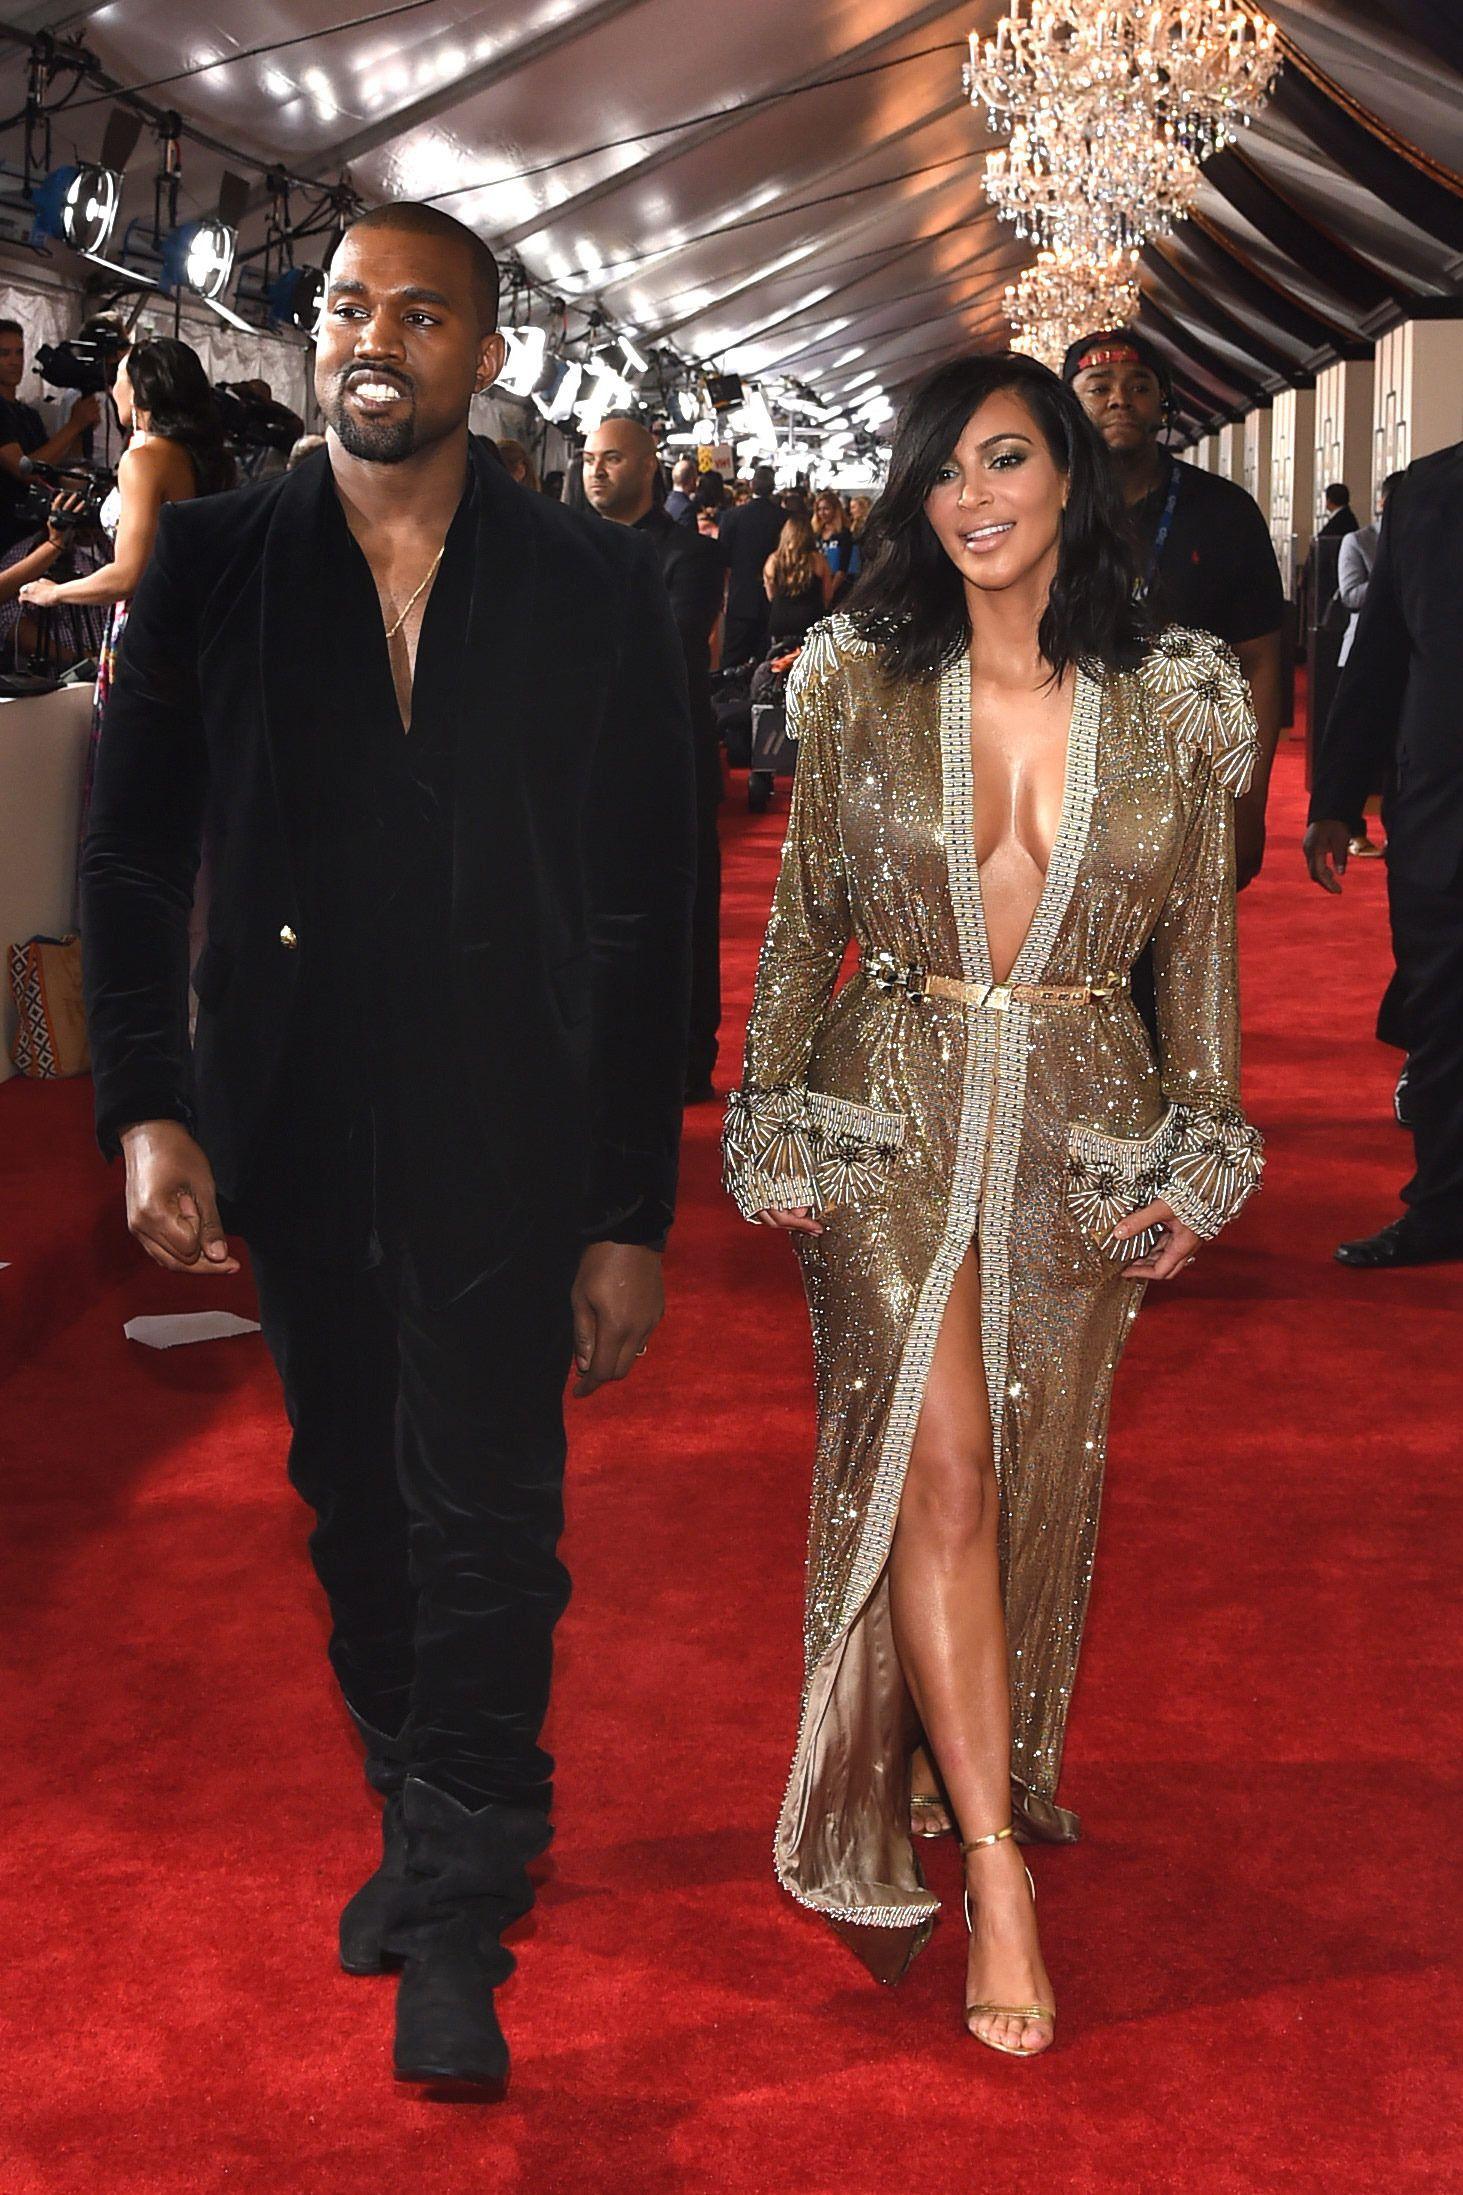 Kim Kardashian Kanye West Kim And Kanye Kim Kardashian Kanye West Kim Kardashian